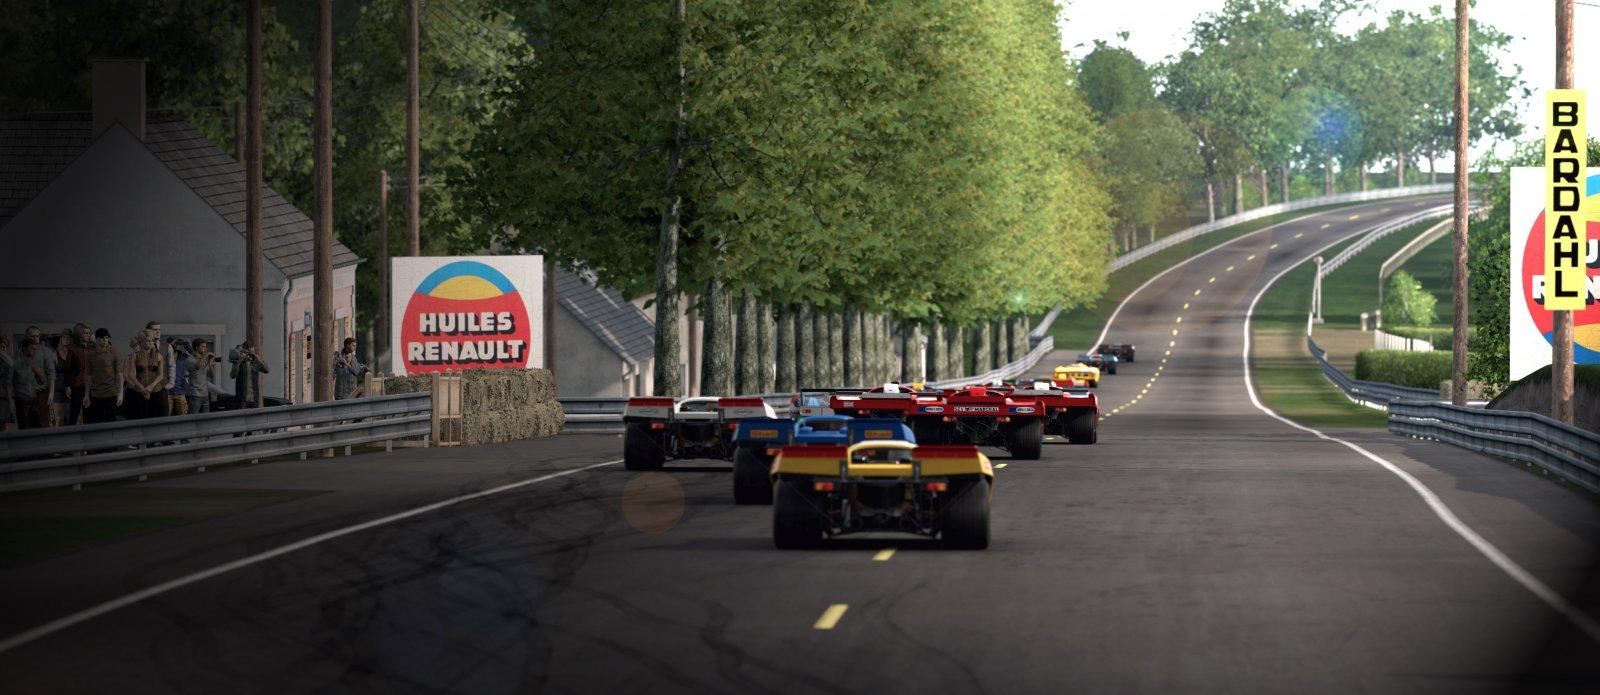 Project CARS 2 Screenshot 2018.06.06 - 00.30.42.00k.jpg